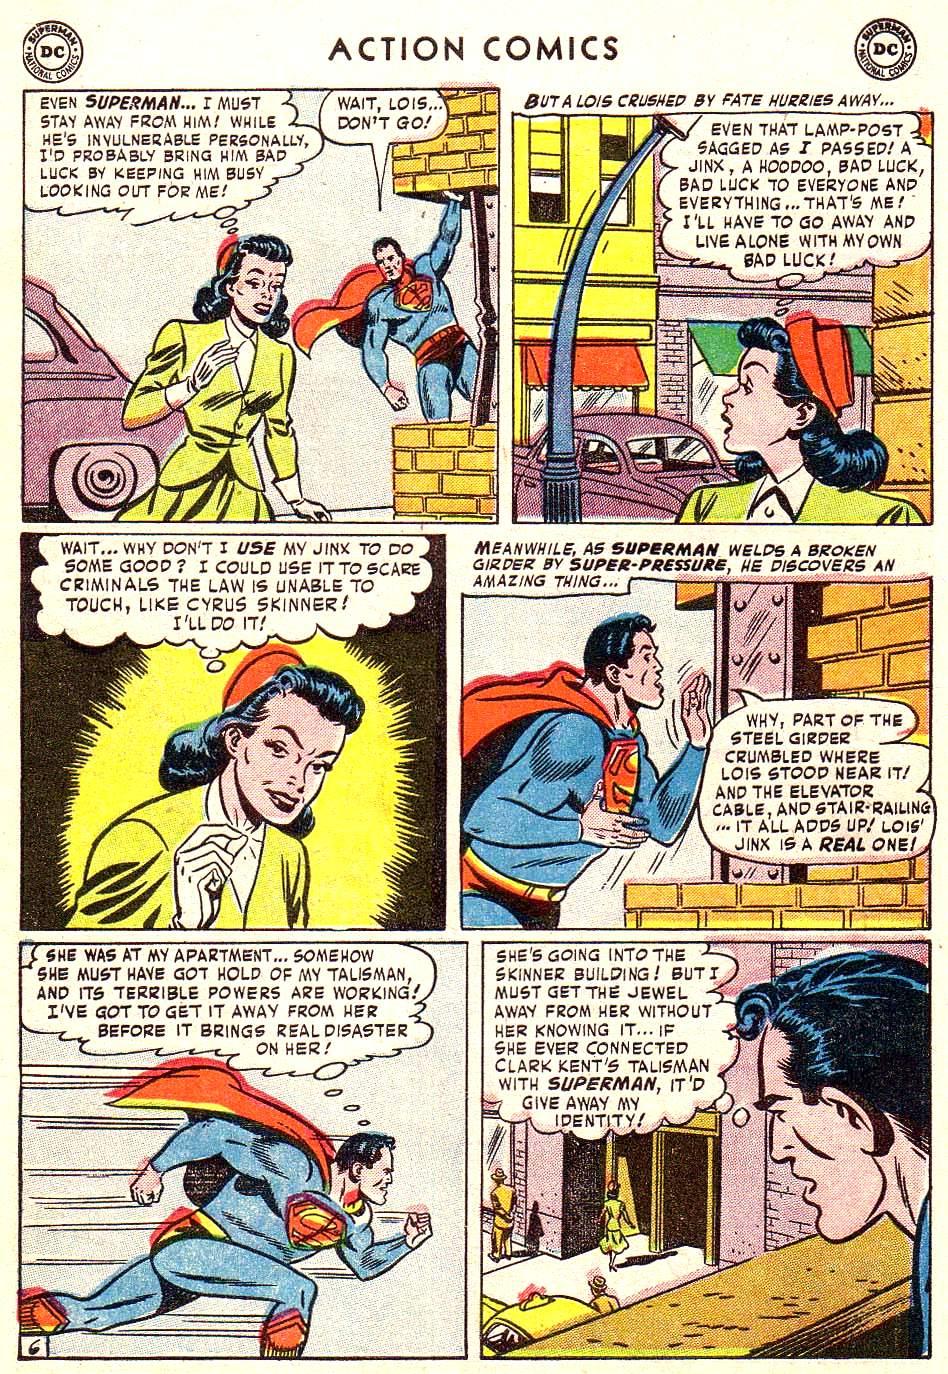 Action Comics (1938) 172 Page 7